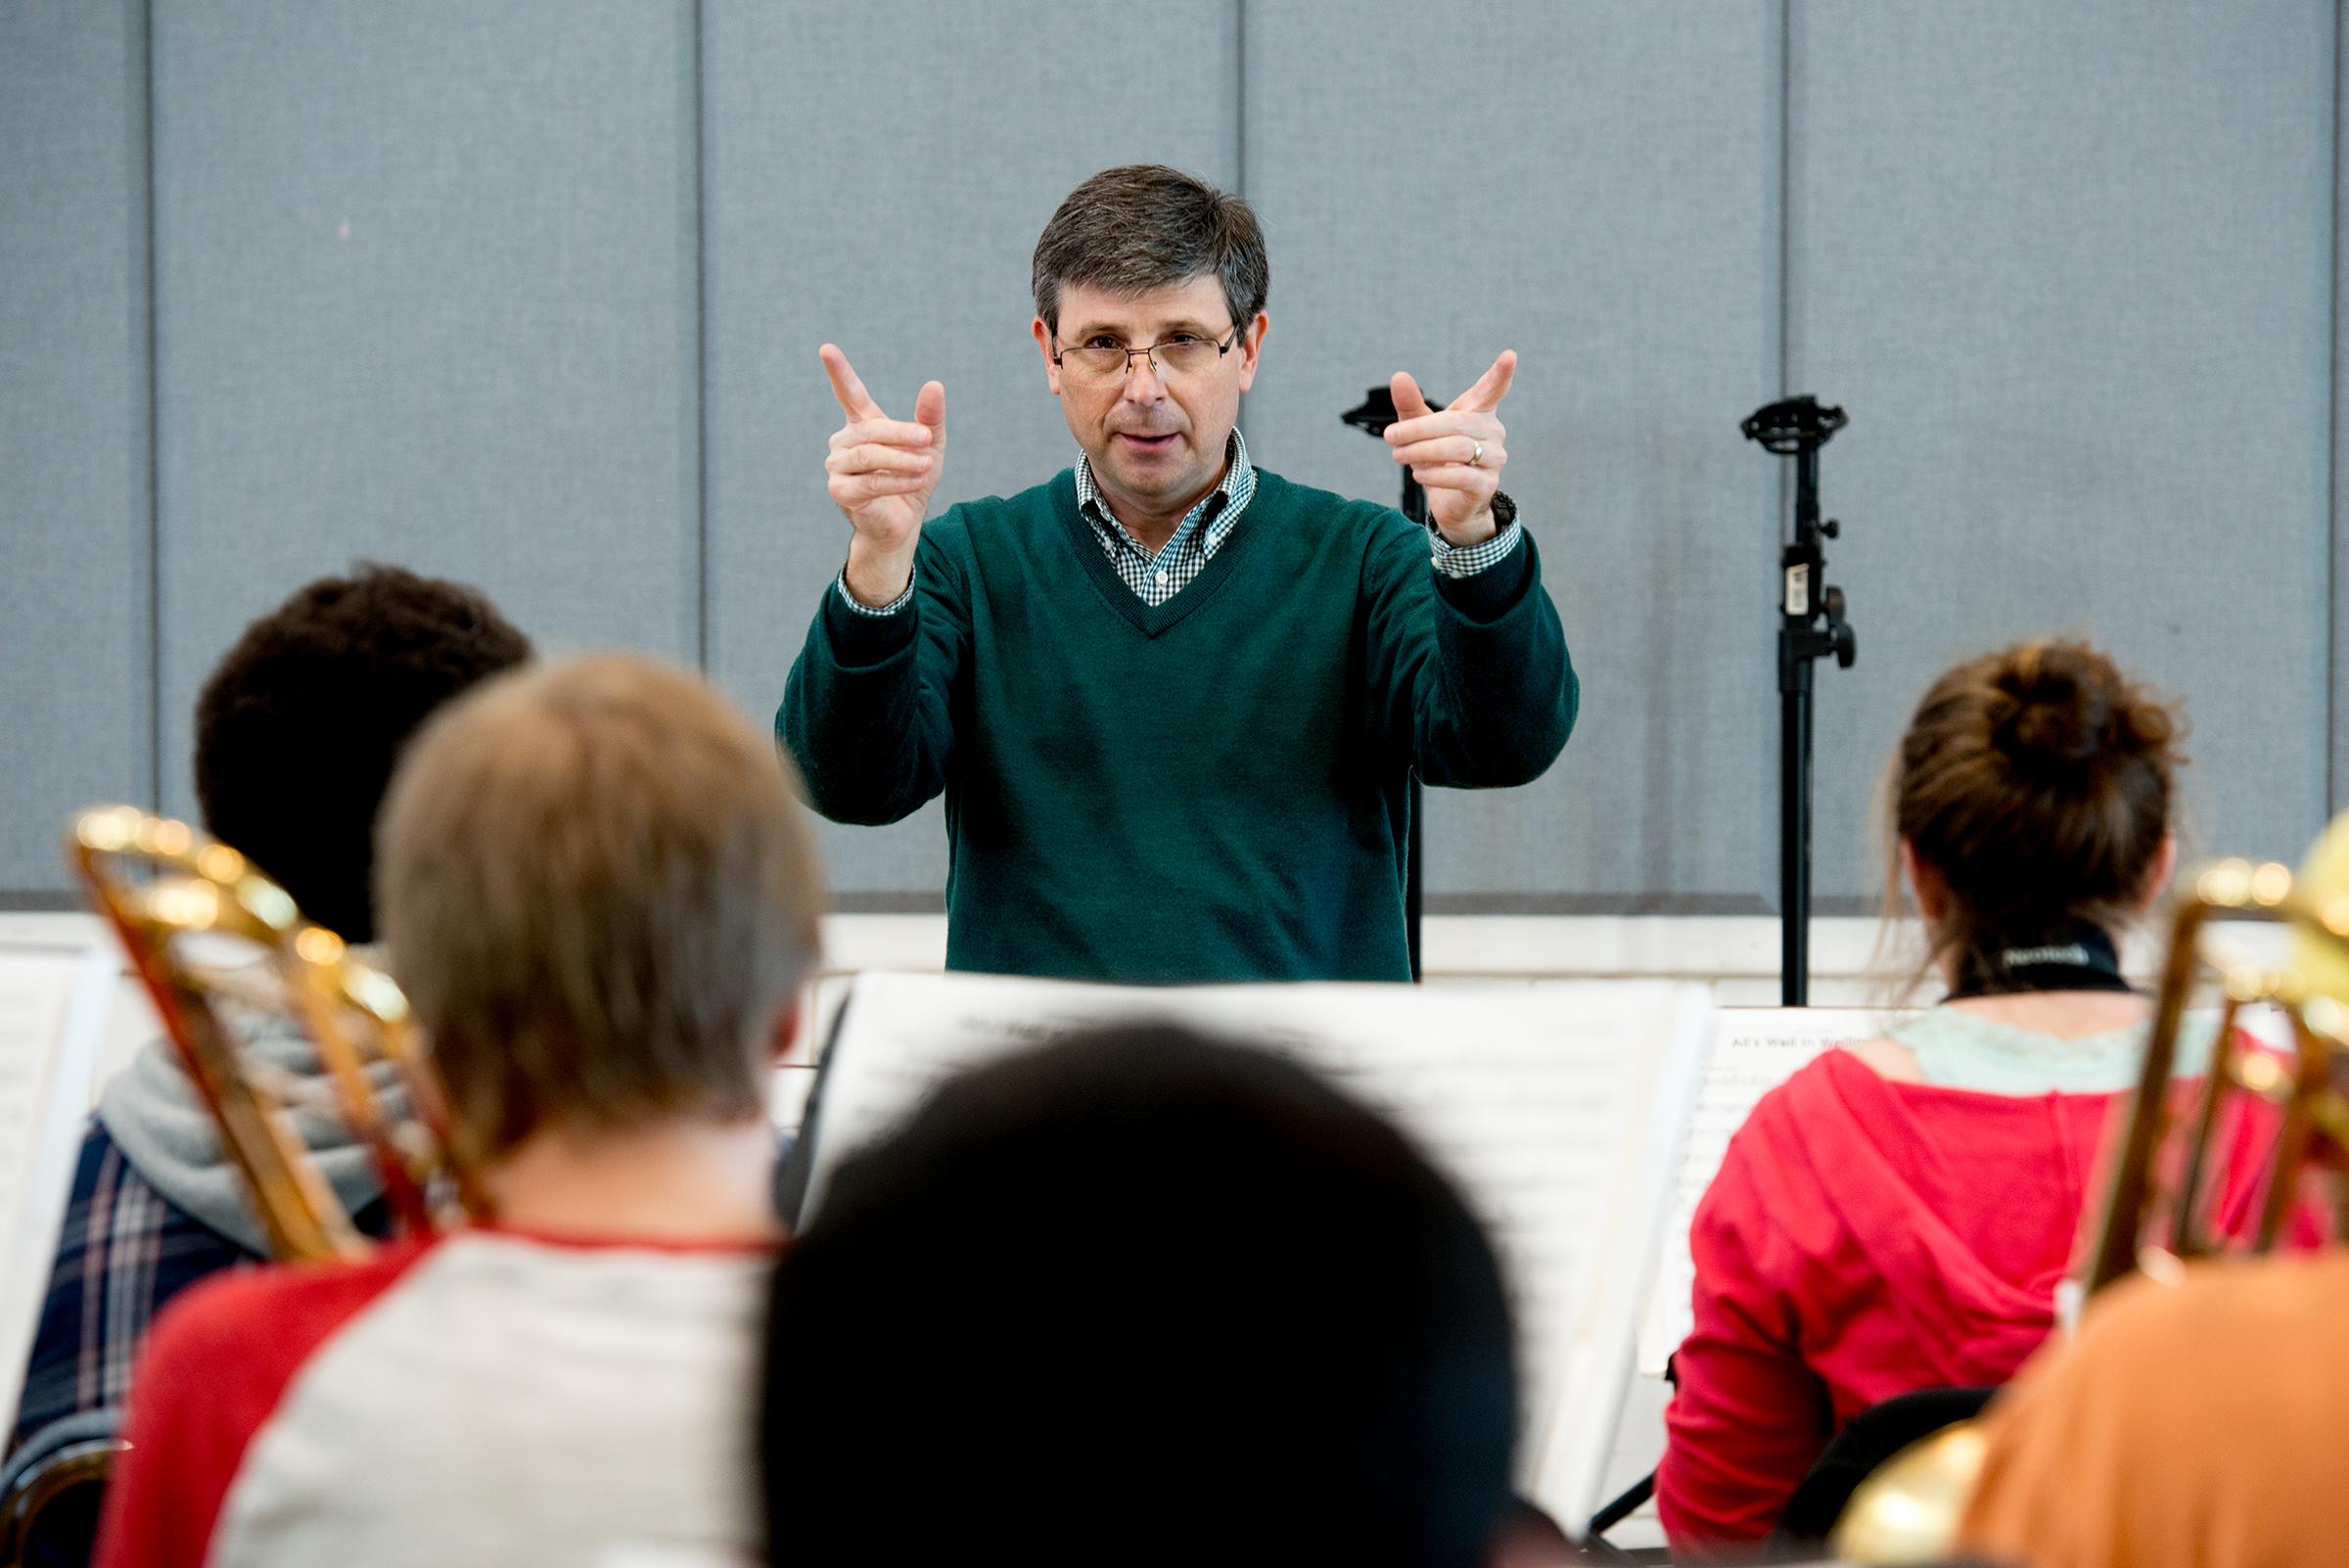 Dr. Joseph Spaniola leads the jazz ensemble rehearsal at the University of West Florida.